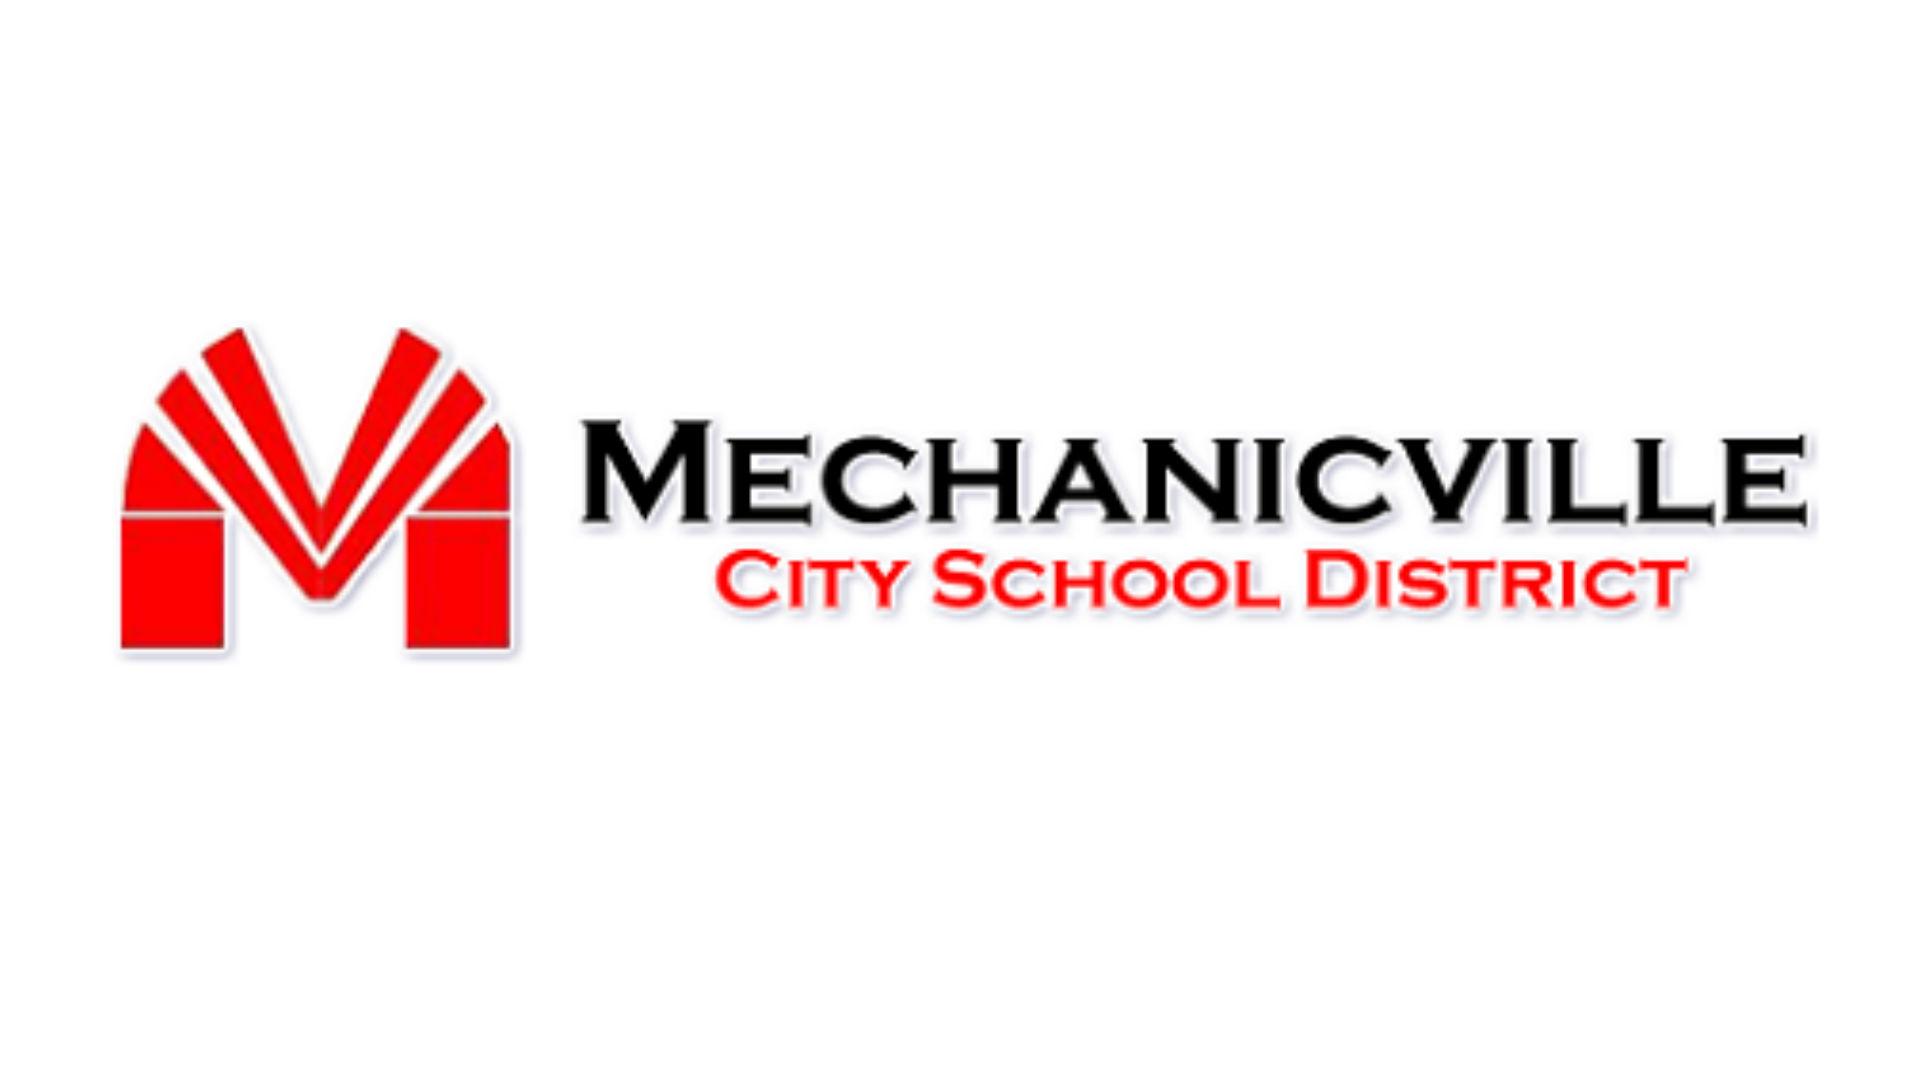 Mechanicville Schools_1549301215979.jpg.jpg